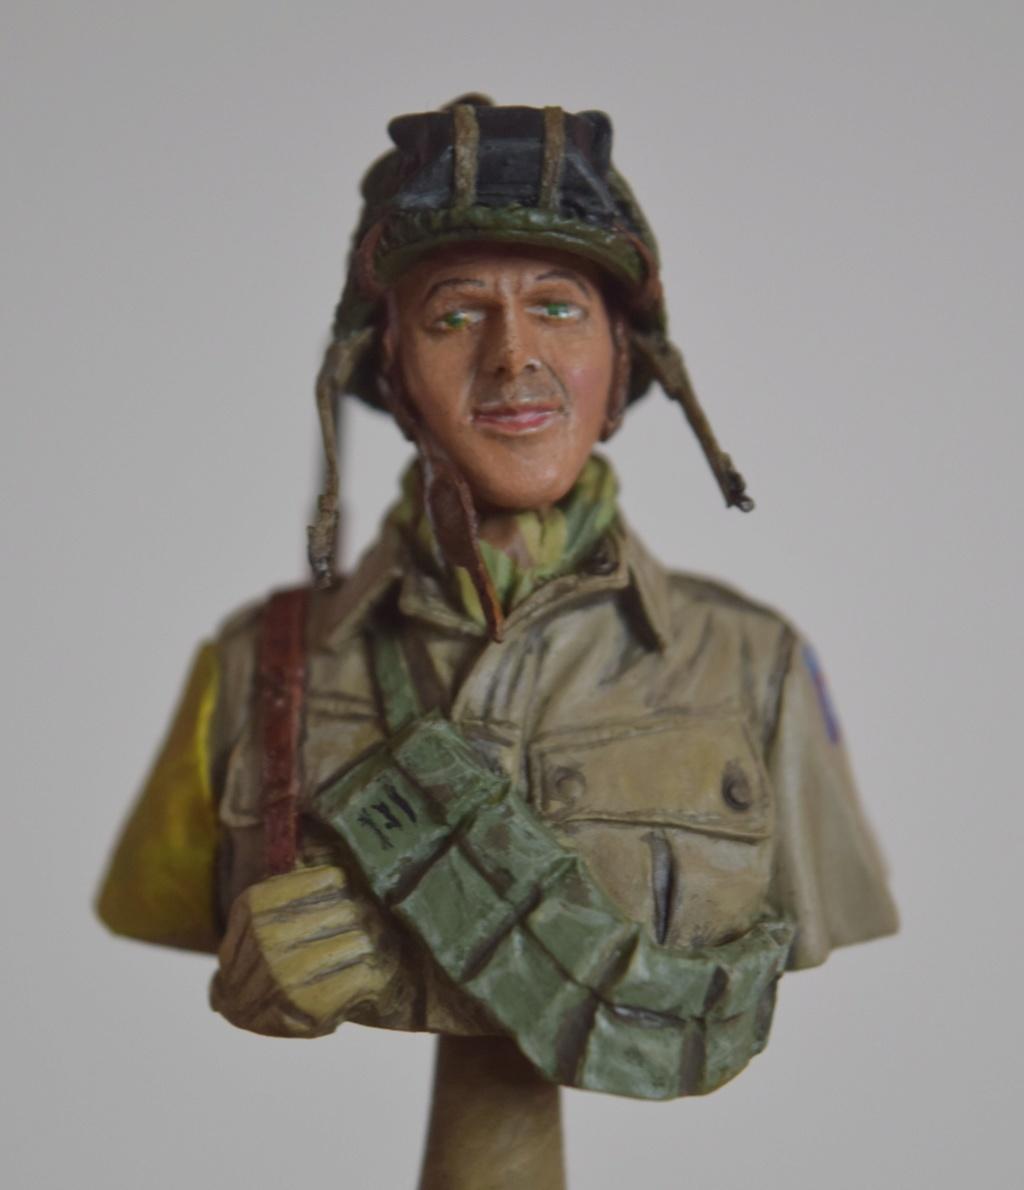 "US Army 82 Airborne """" All american "" - buste  1/16 de chez ALPINE FIGURINES .[ Terminé ] Dsc_0217"